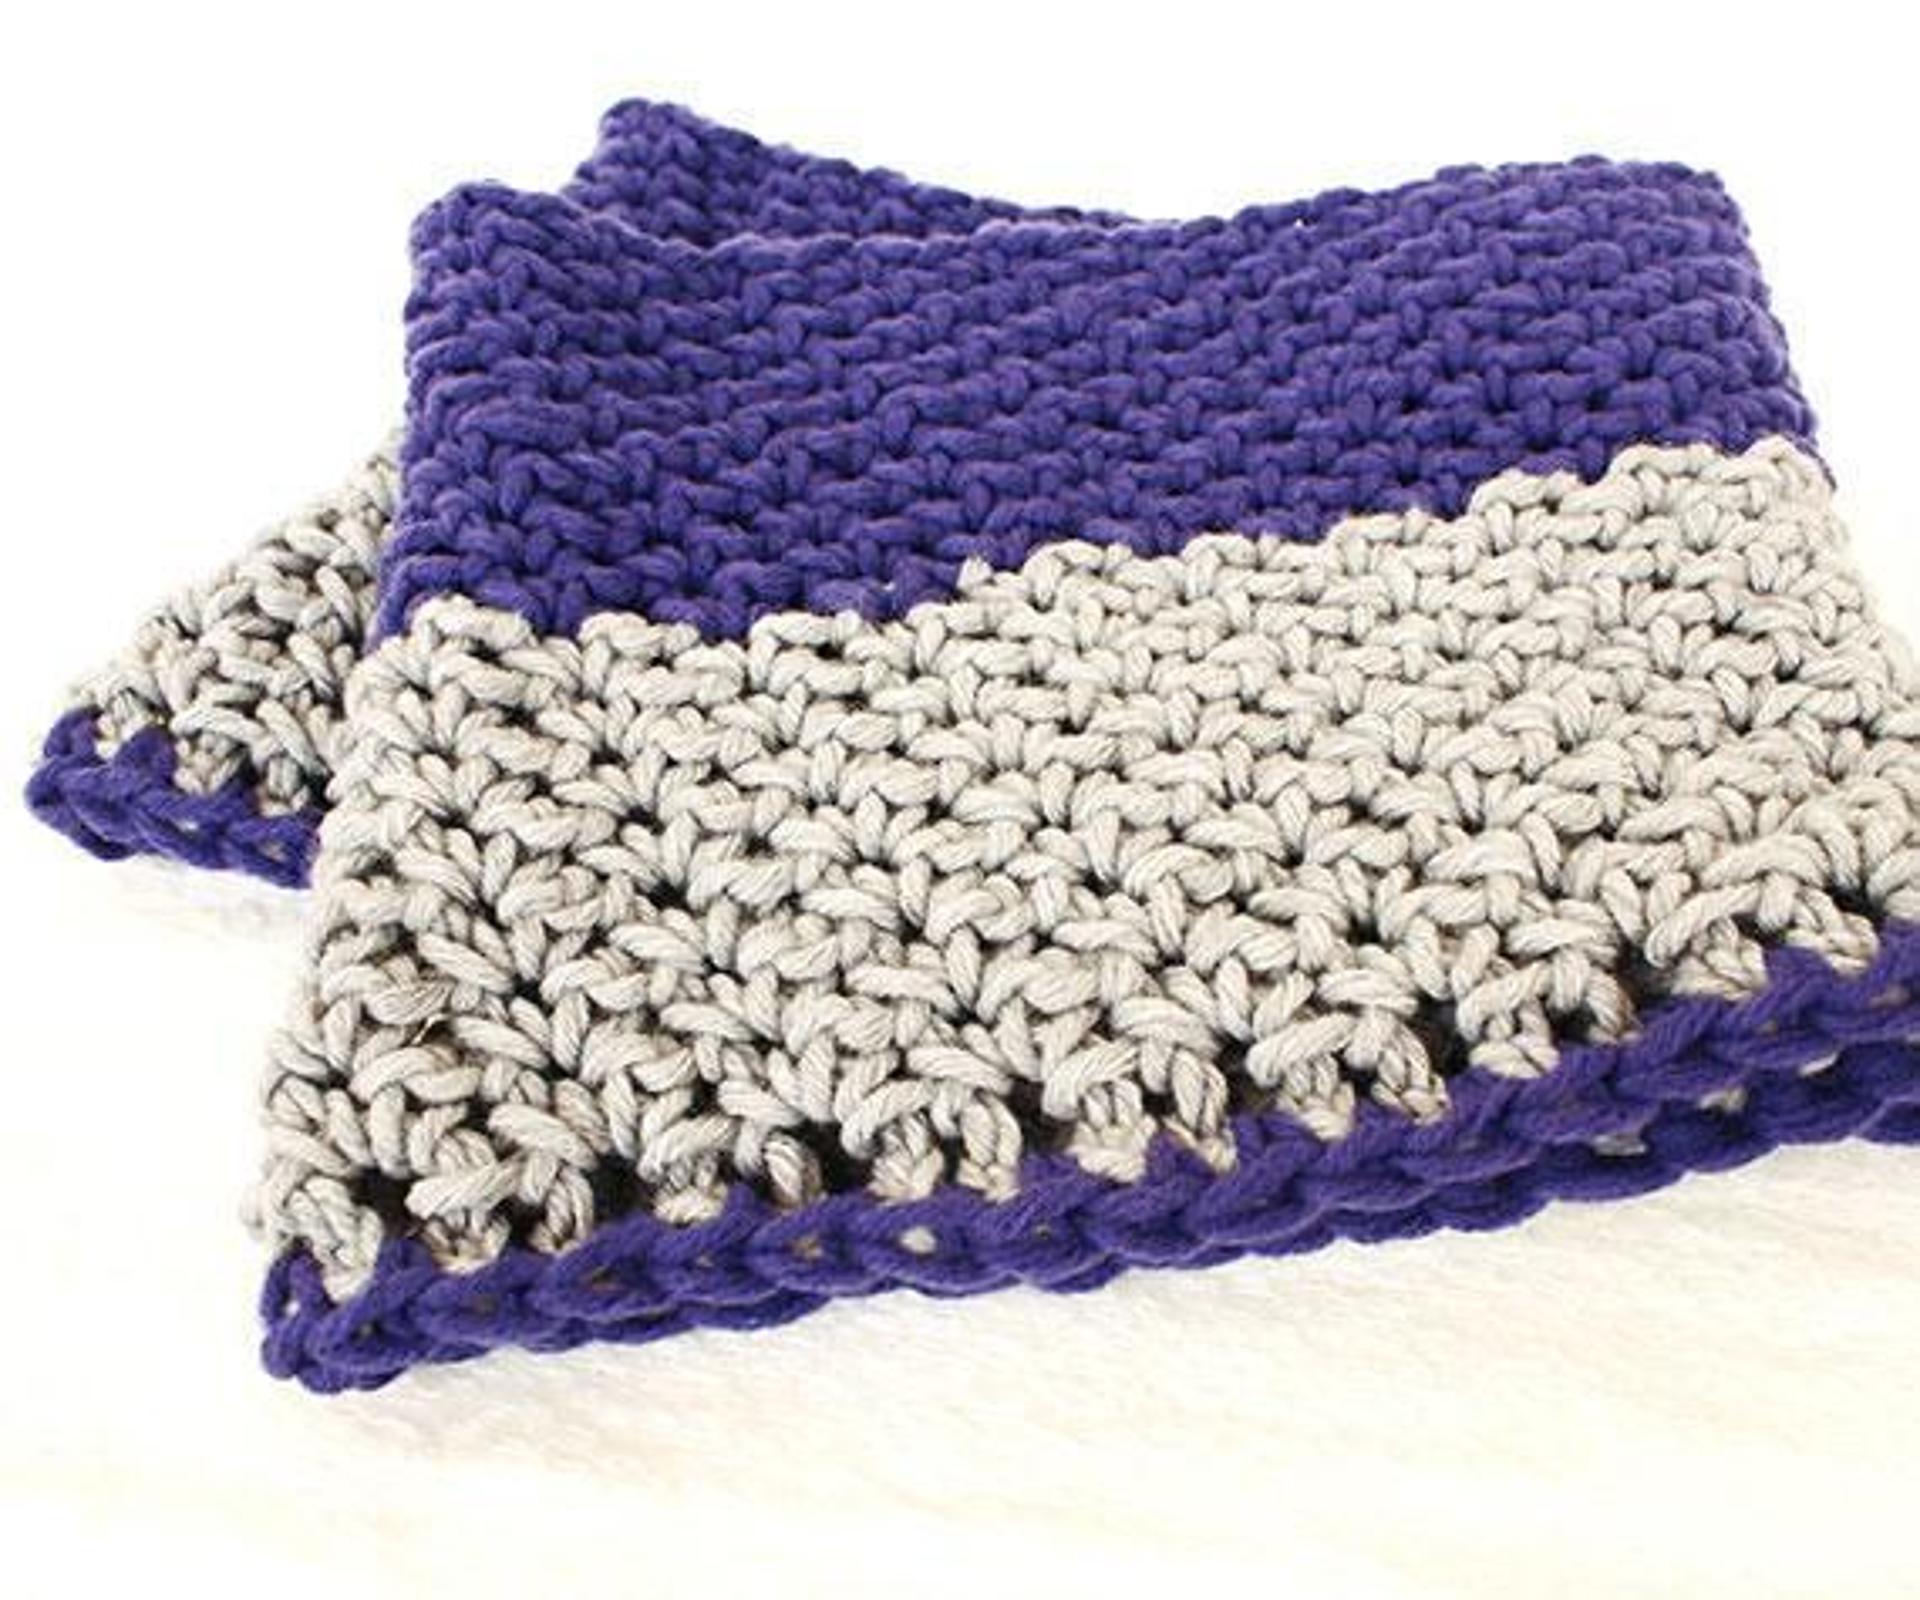 Purple Grey Infinity and Beyond Cowl